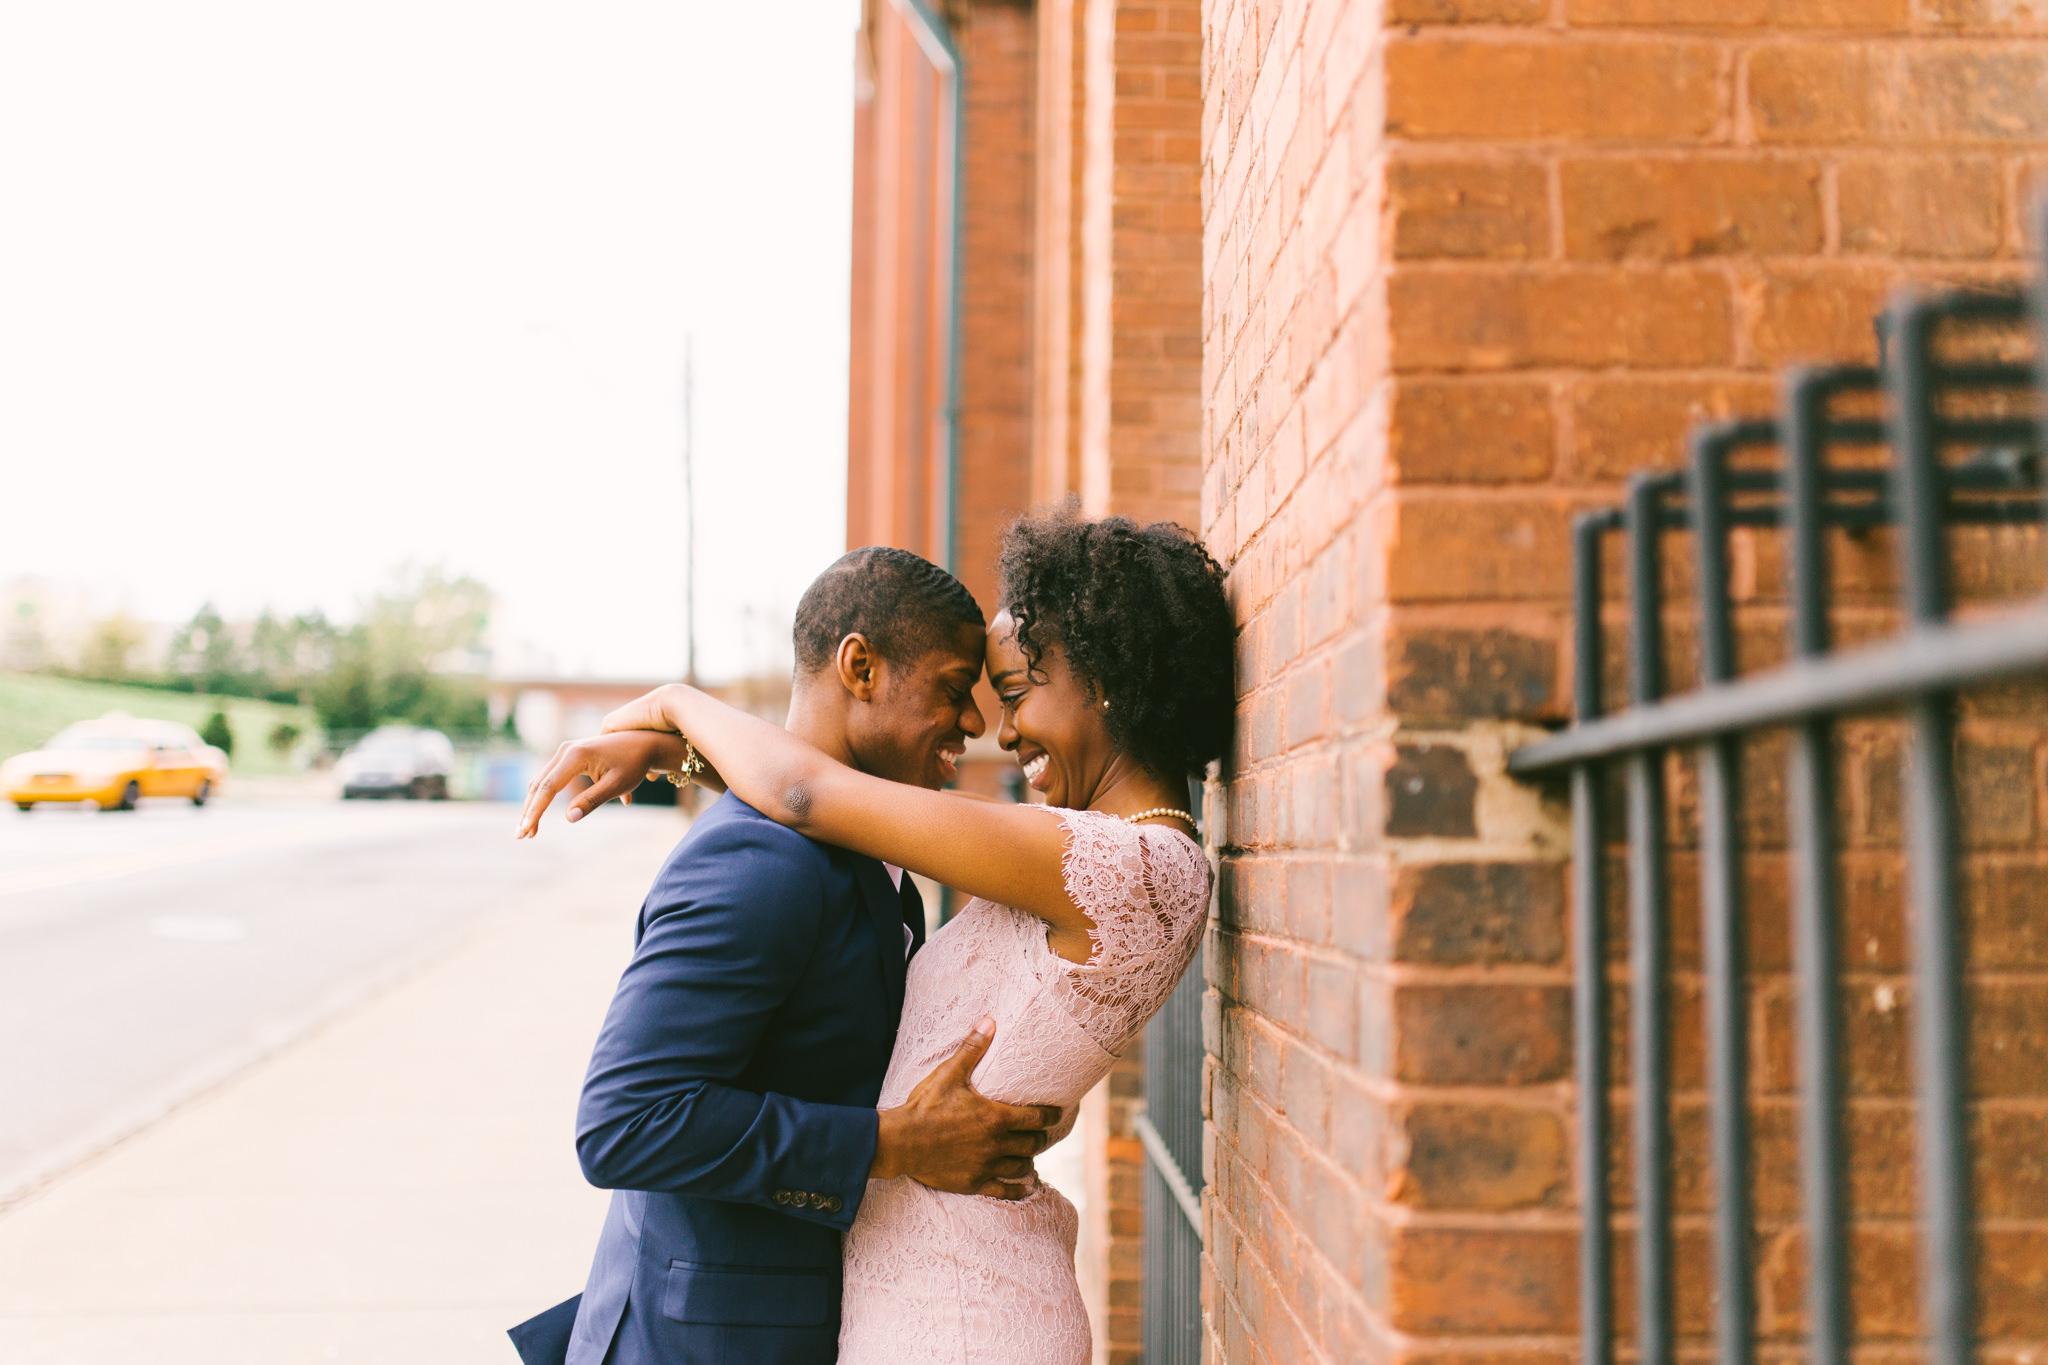 Grant-Park-Atlanta-Engagement-Pictures-Kiyah-C-Photography-11.jpg